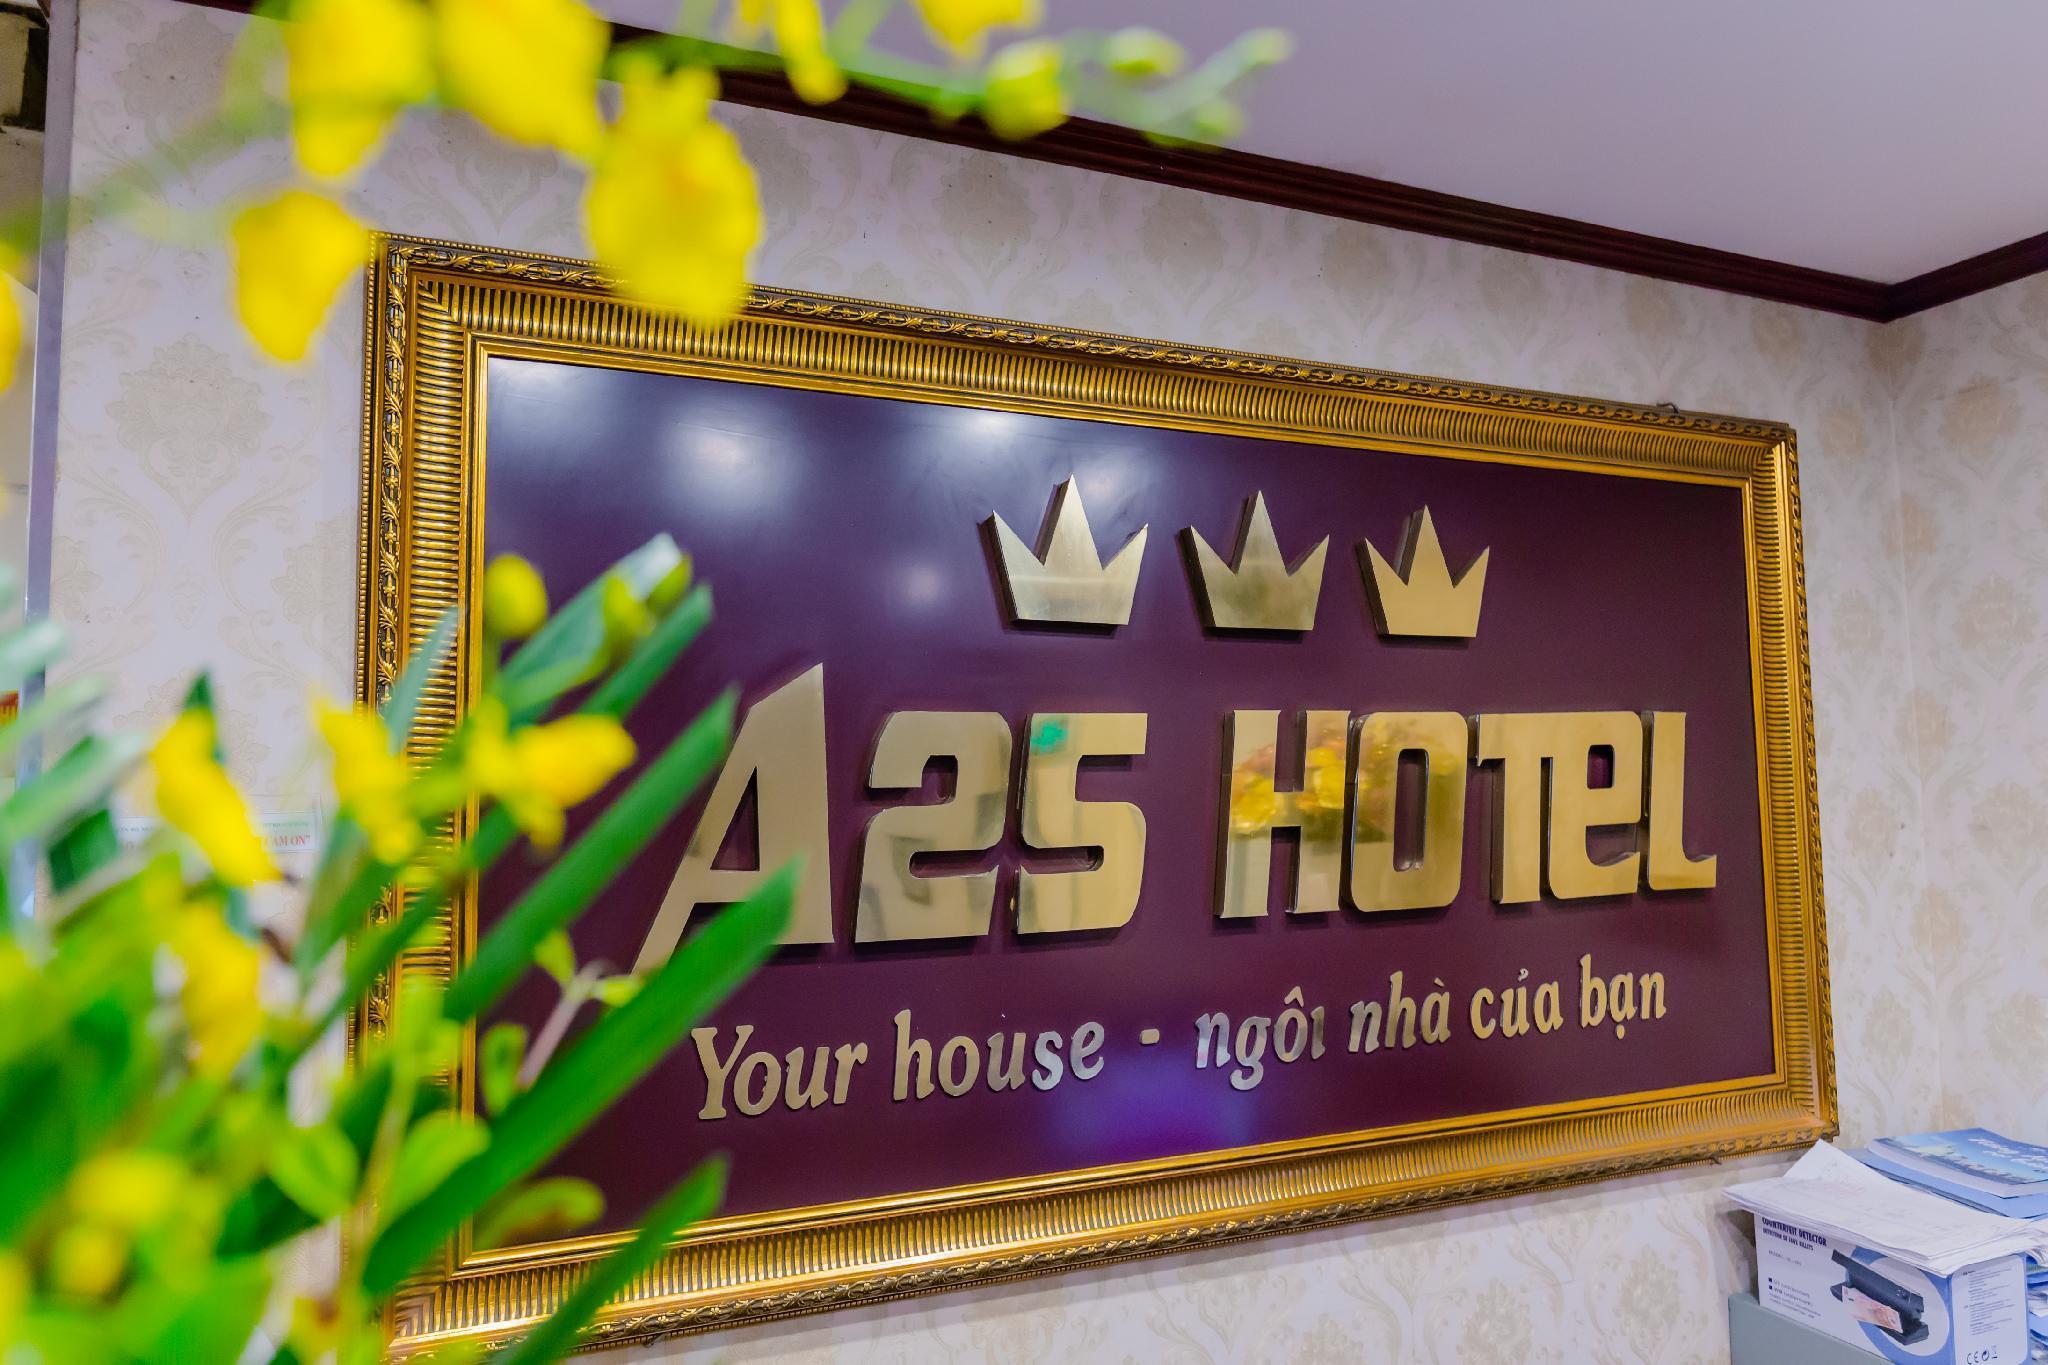 New Asean Hotel - Doi Can, Ba Đình